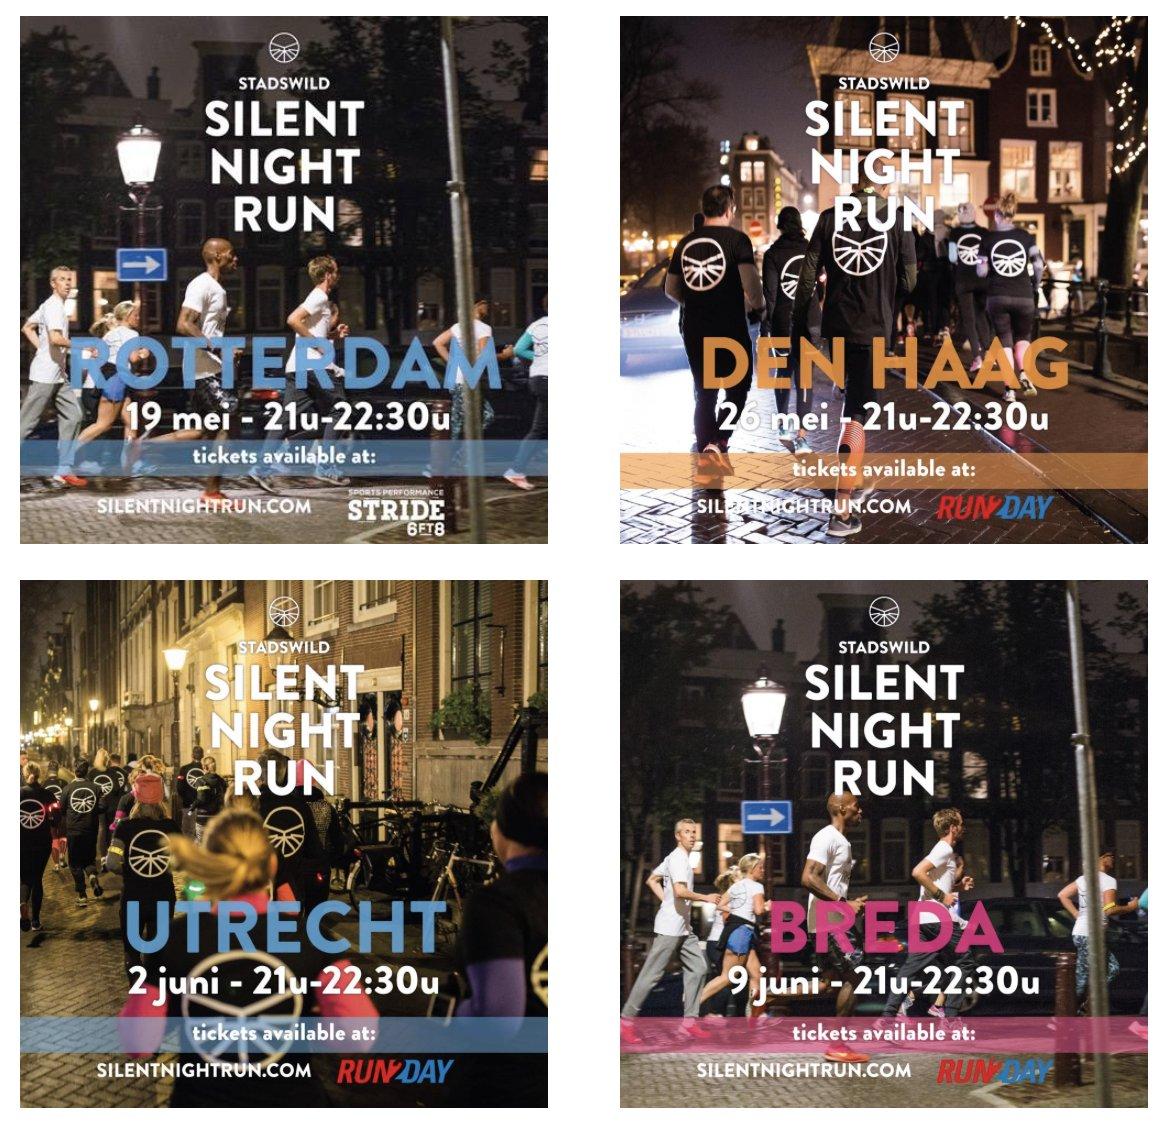 Jongens en meisjes #Rotterdam #DenHaag #Breda #Utrecht echt doen #silentnightrun @Stadswild https://t.co/PPLz42R5BJ